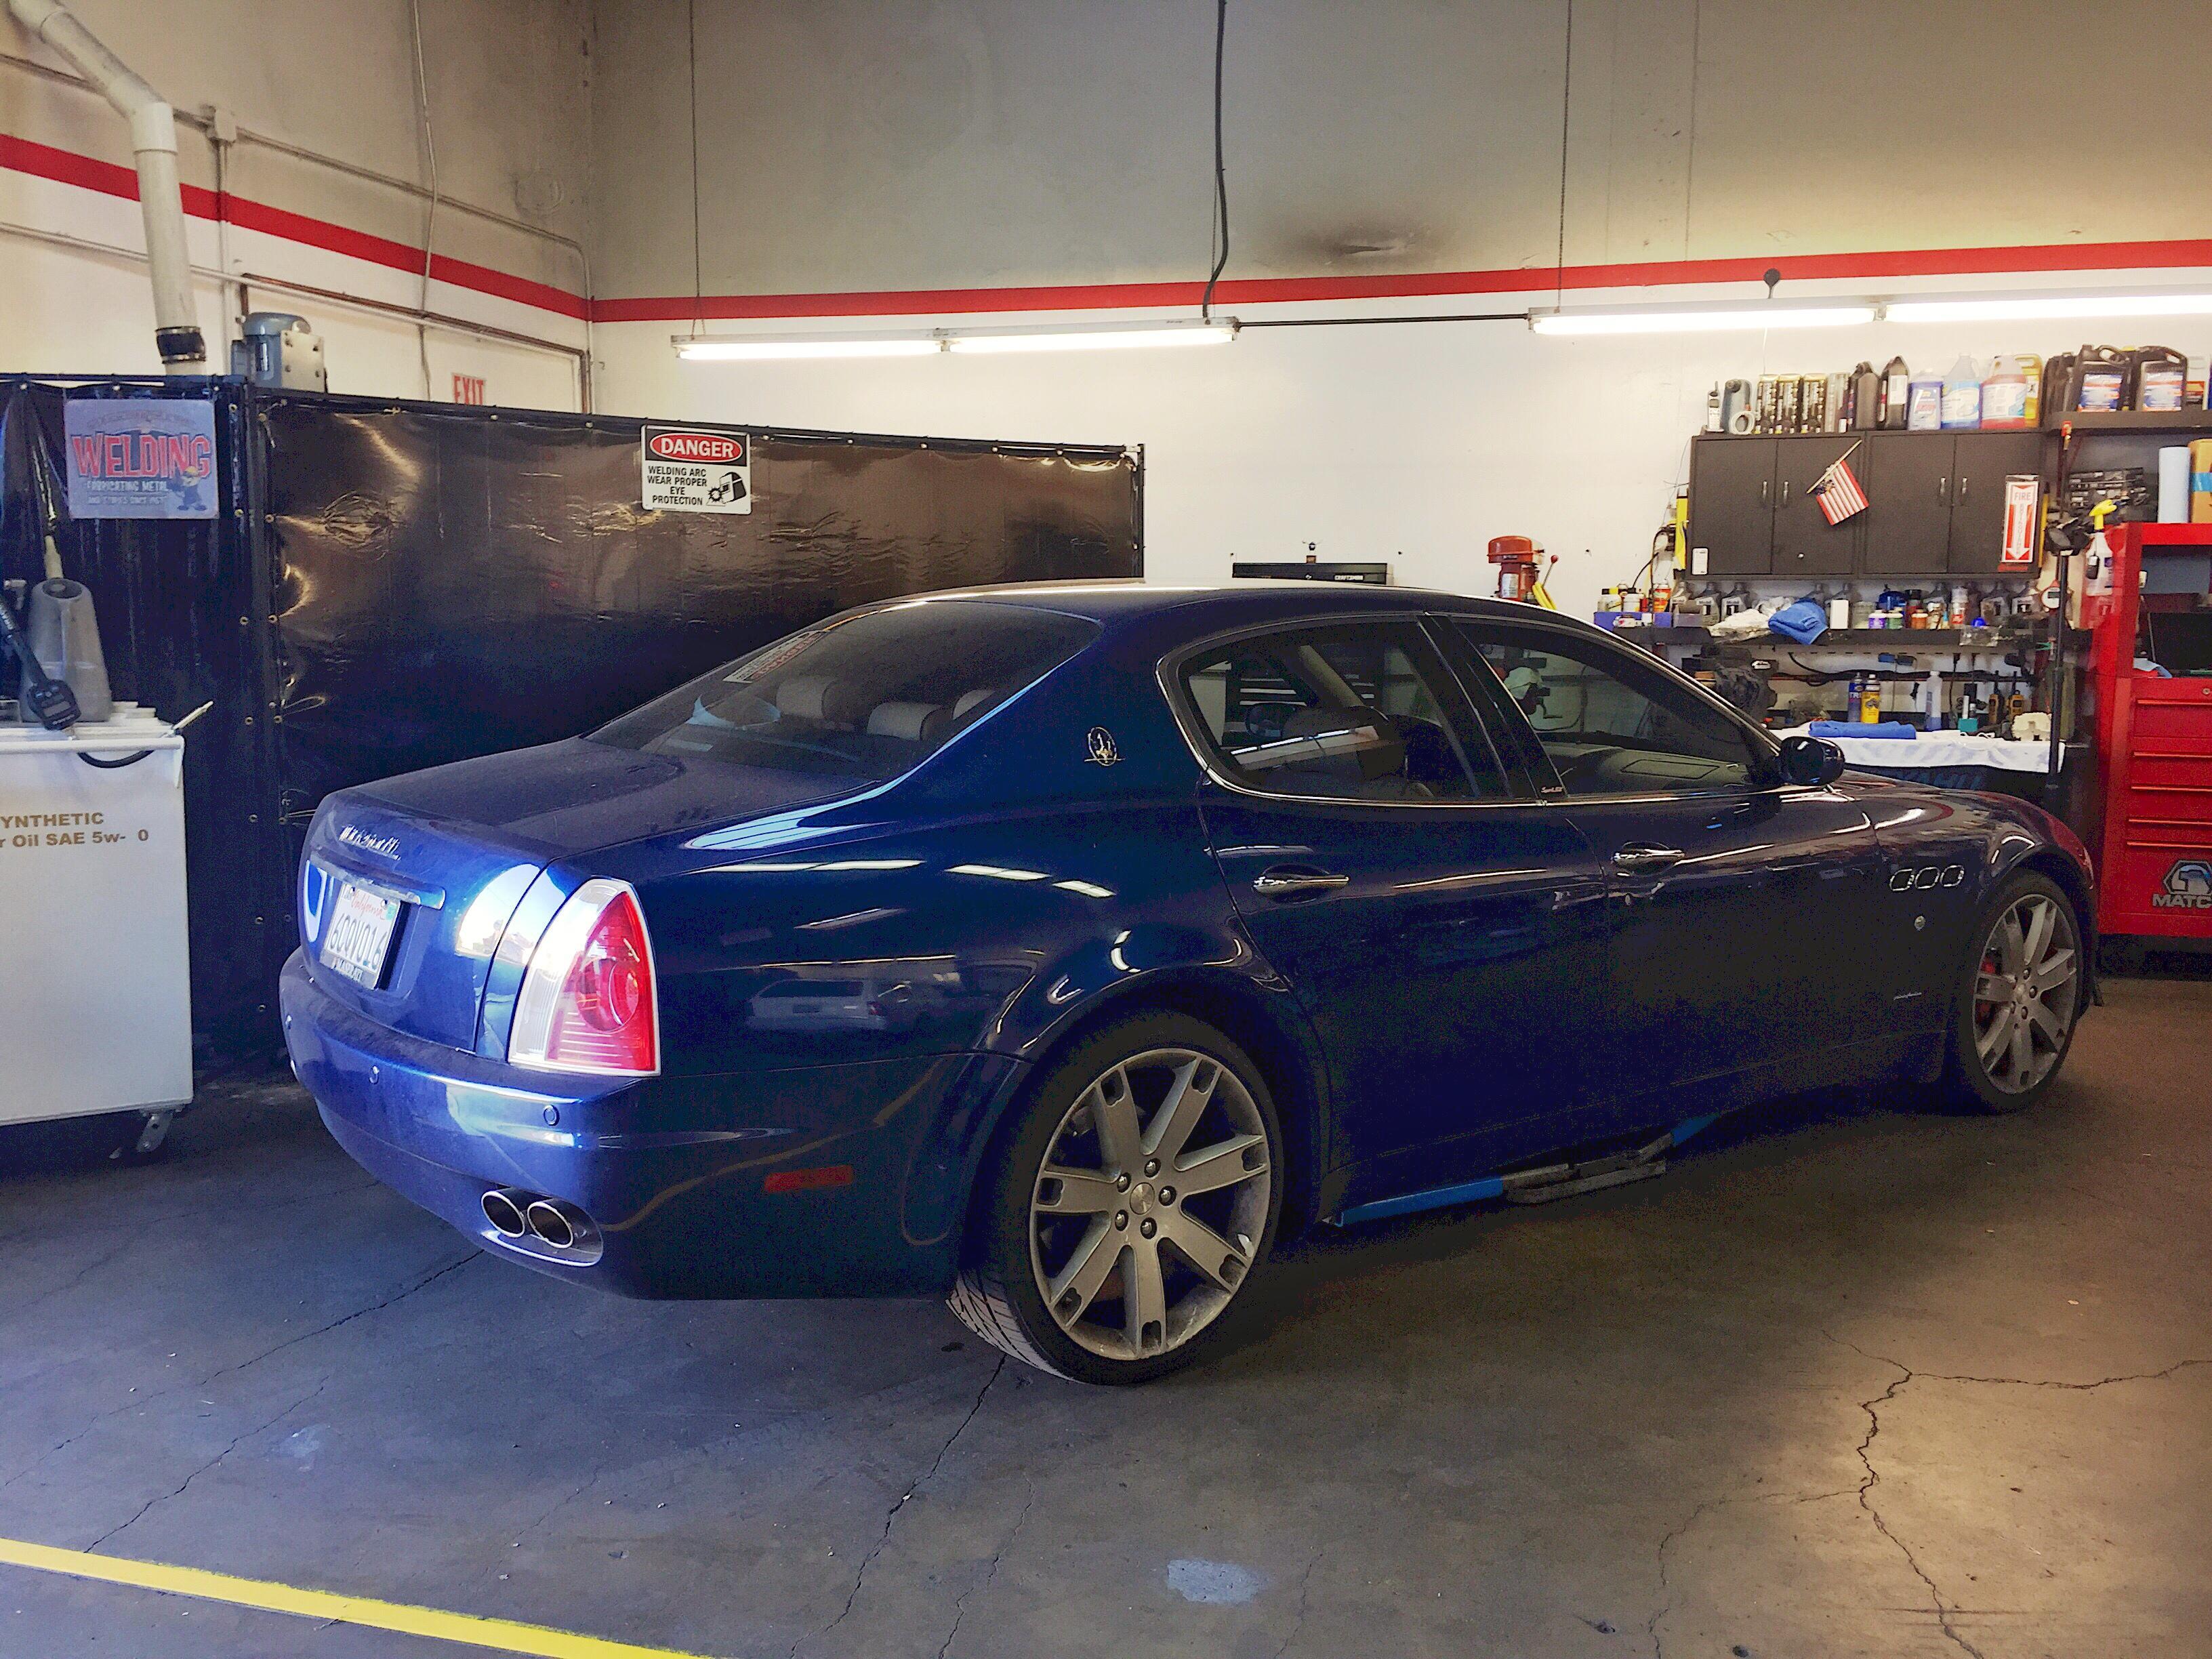 Ecar garage palo alto california ca for Park avenue motors mercedes benz palo alto